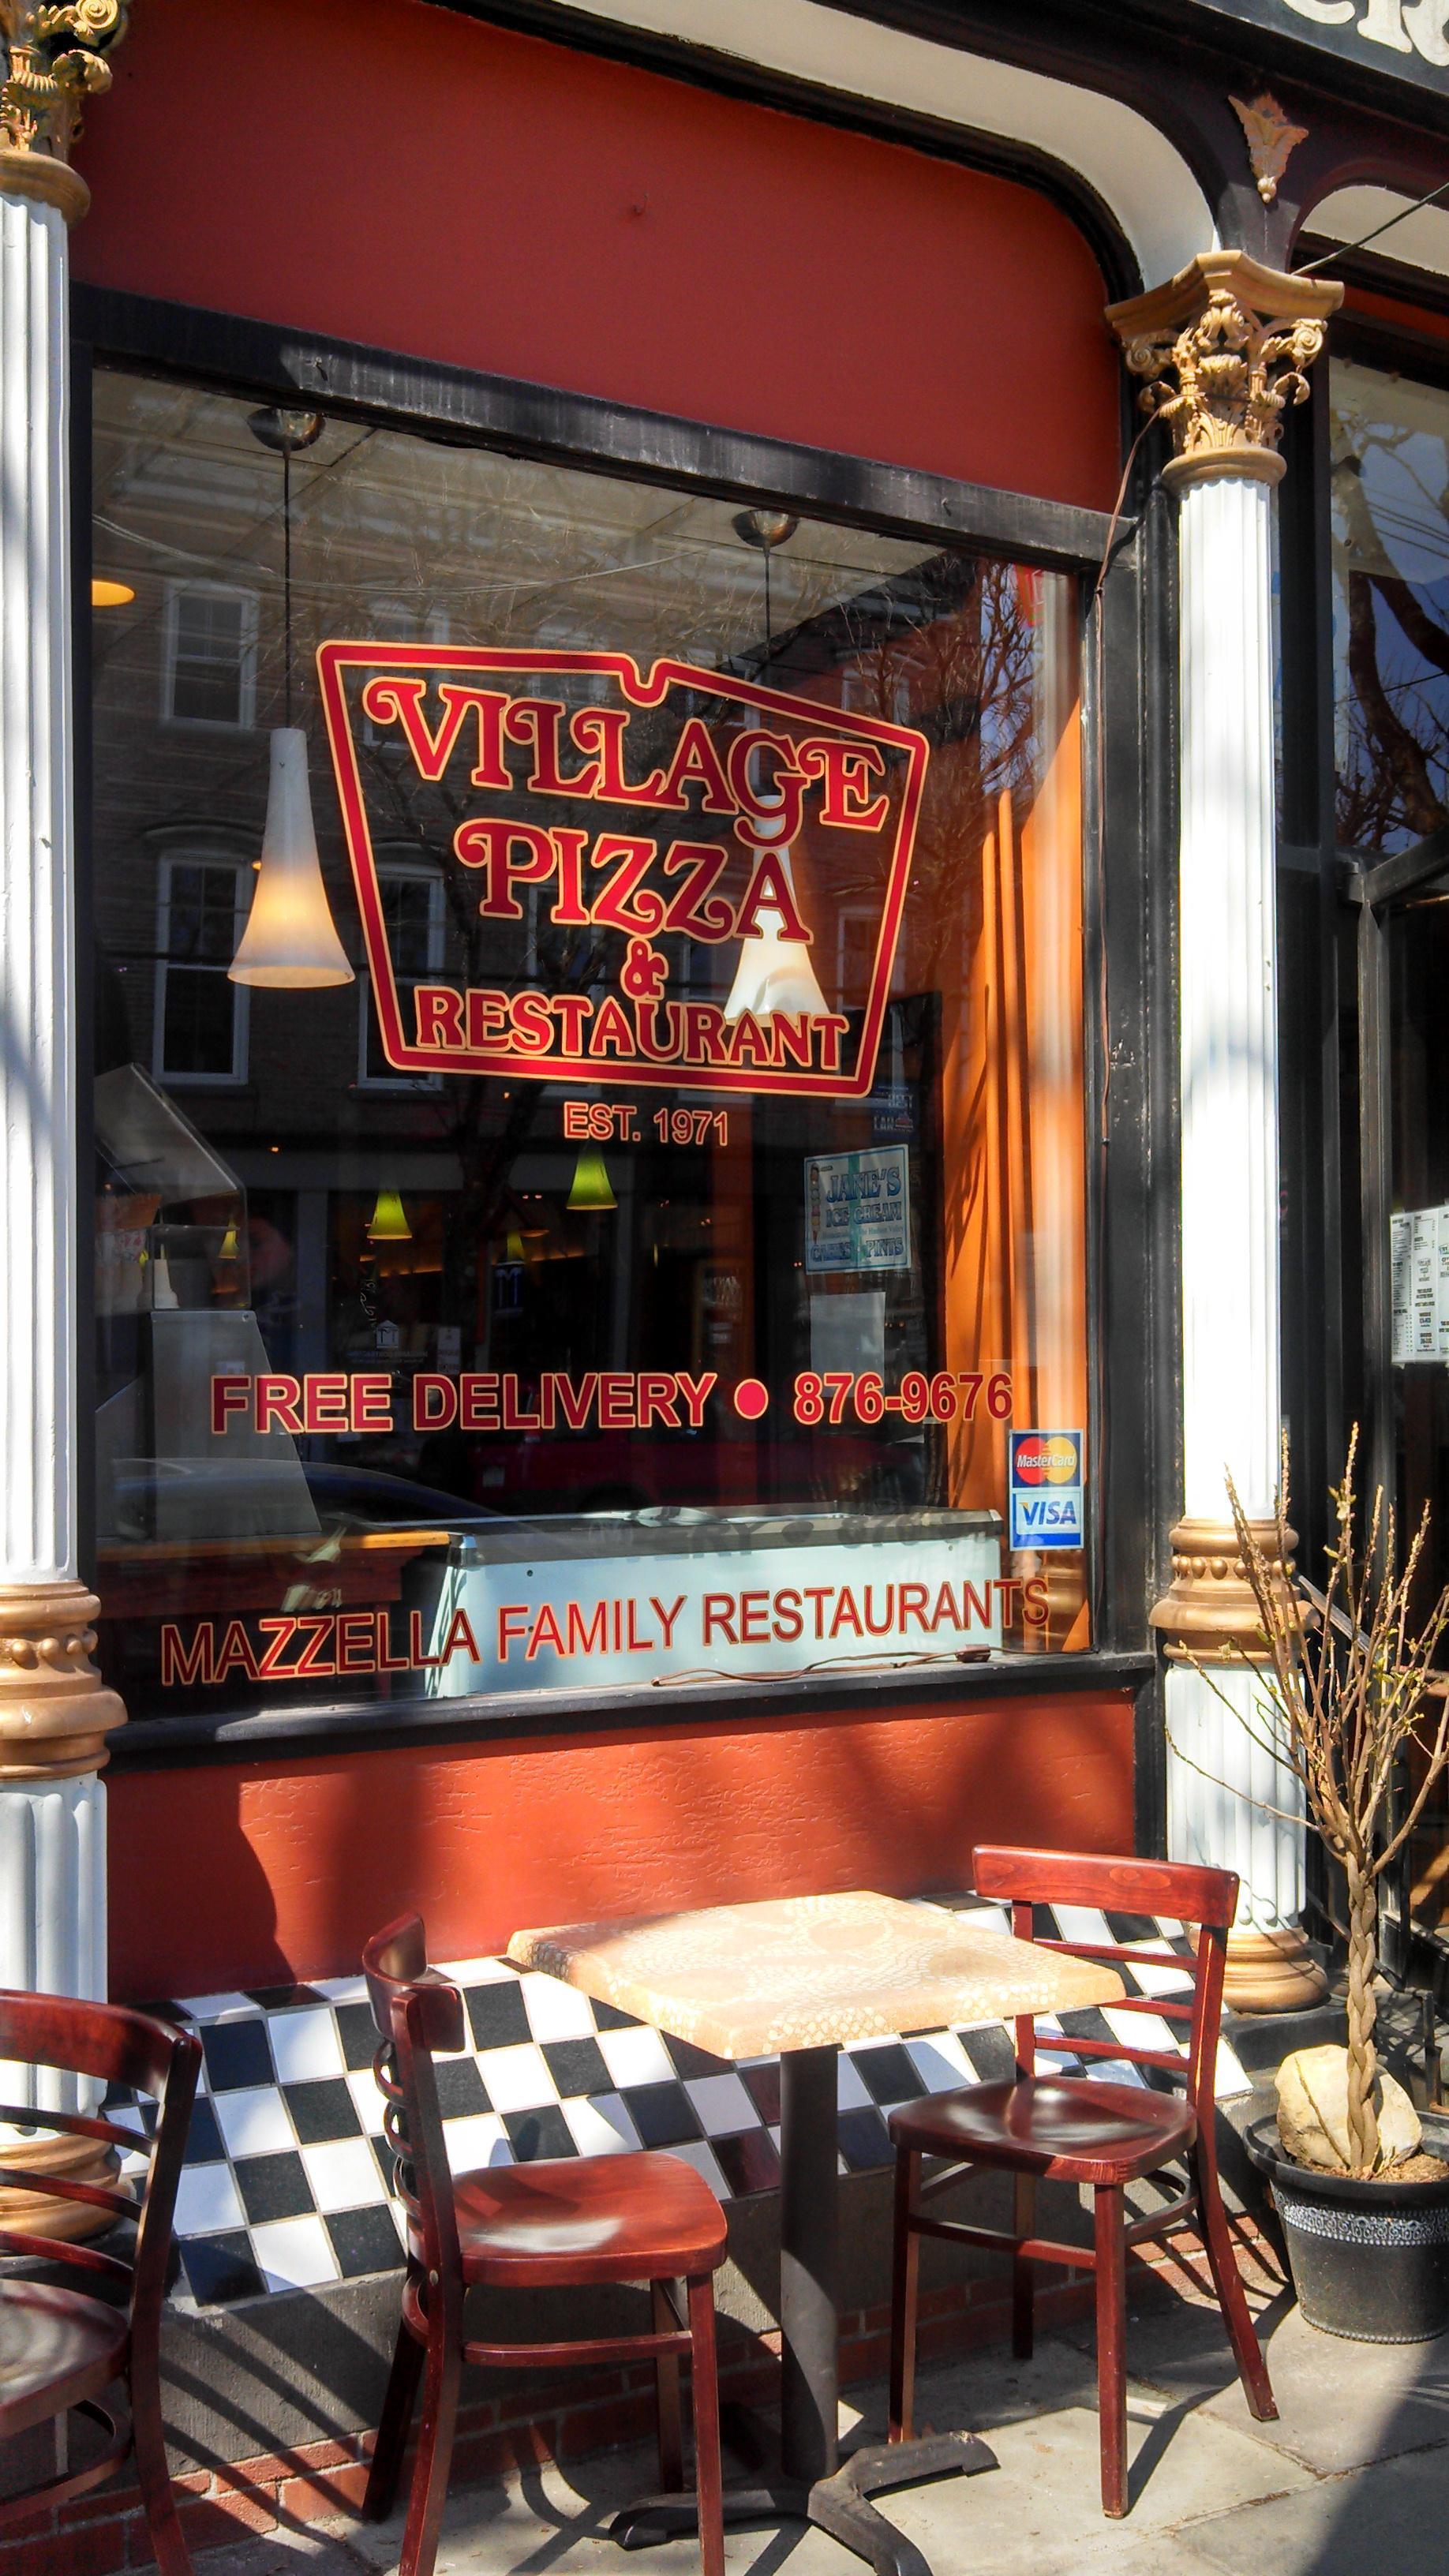 Village Pizza of Rhinebeck, Rhinebeck NY